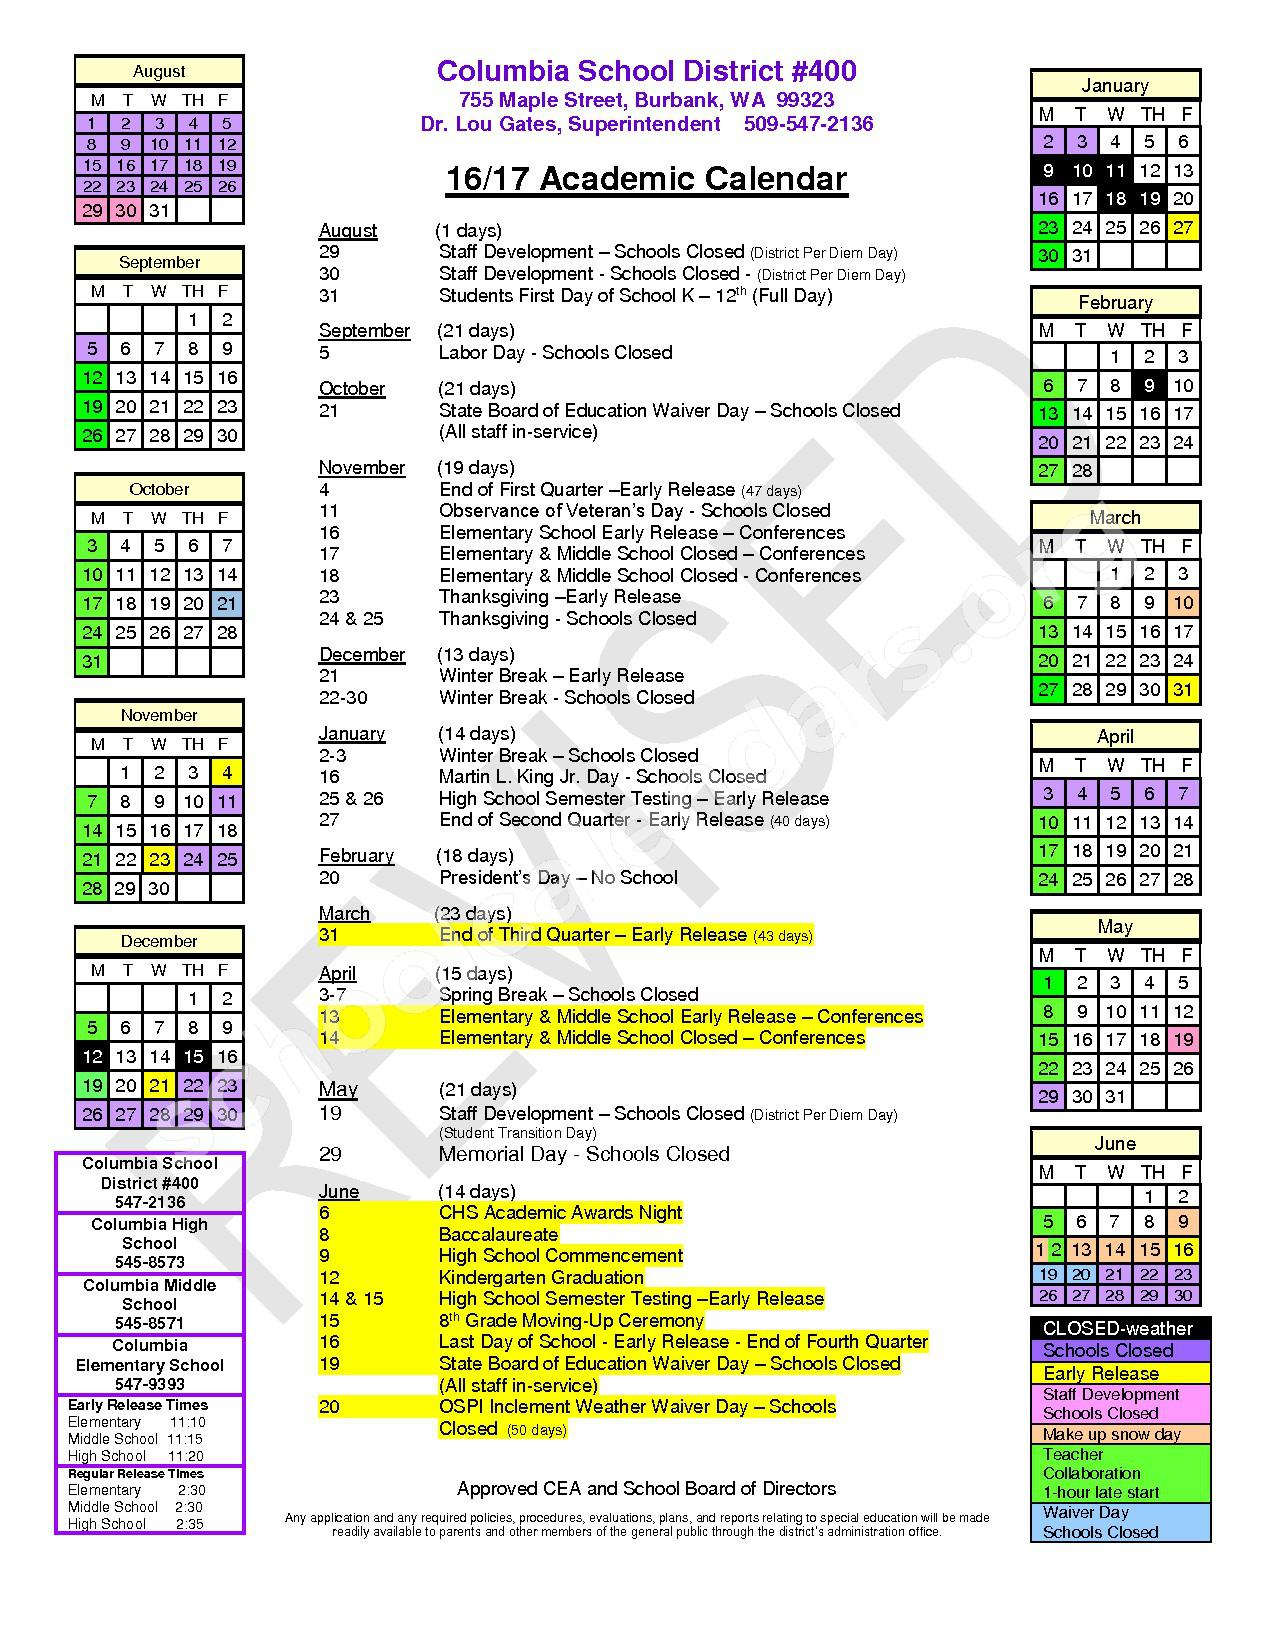 2016 - 2017 Academic Calendar page 1